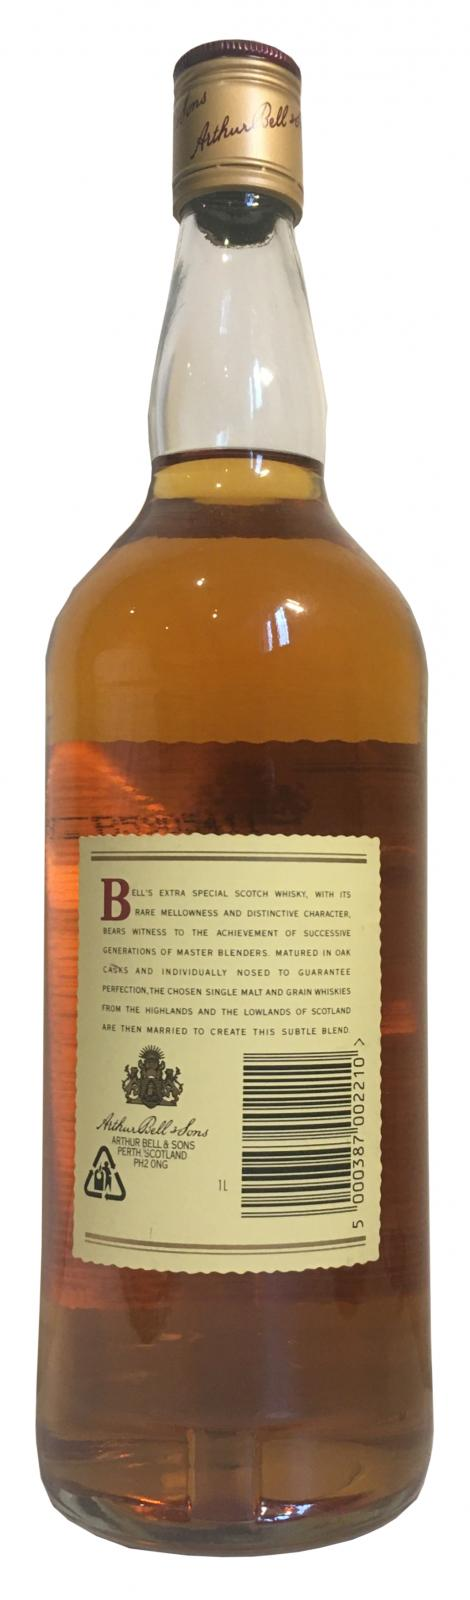 Bell's Finest Old Scotch Whisky